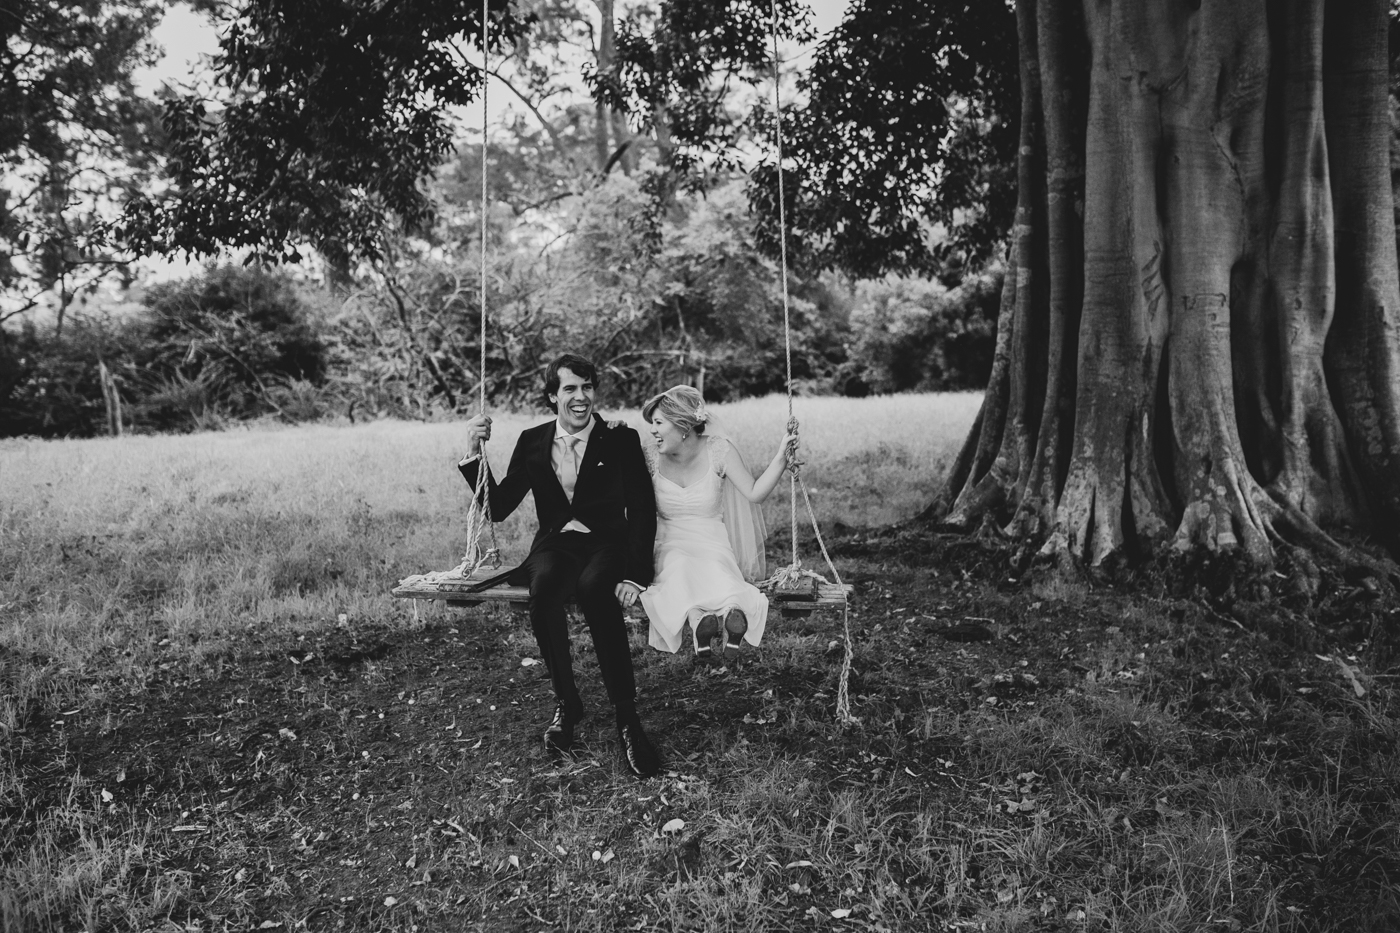 Rachel & Jacob - Willow Farm Berry - South Coast Wedding - Samantha Heather Photography-142.jpg